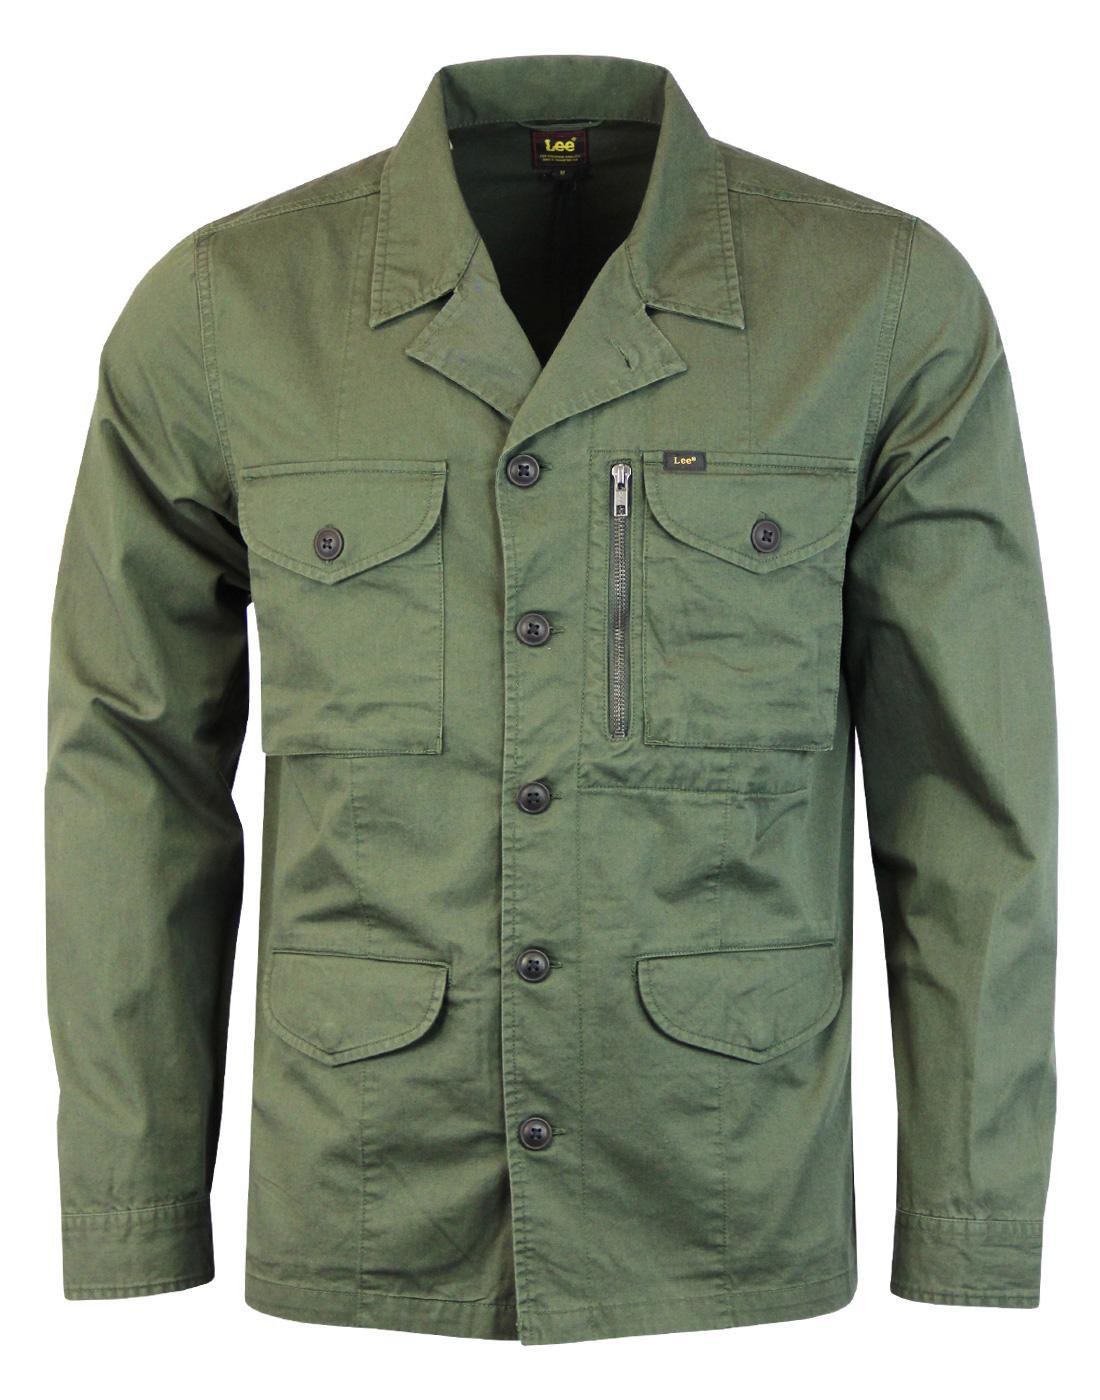 LEE Retro 70s Mod Twill Military Overshirt Jacket